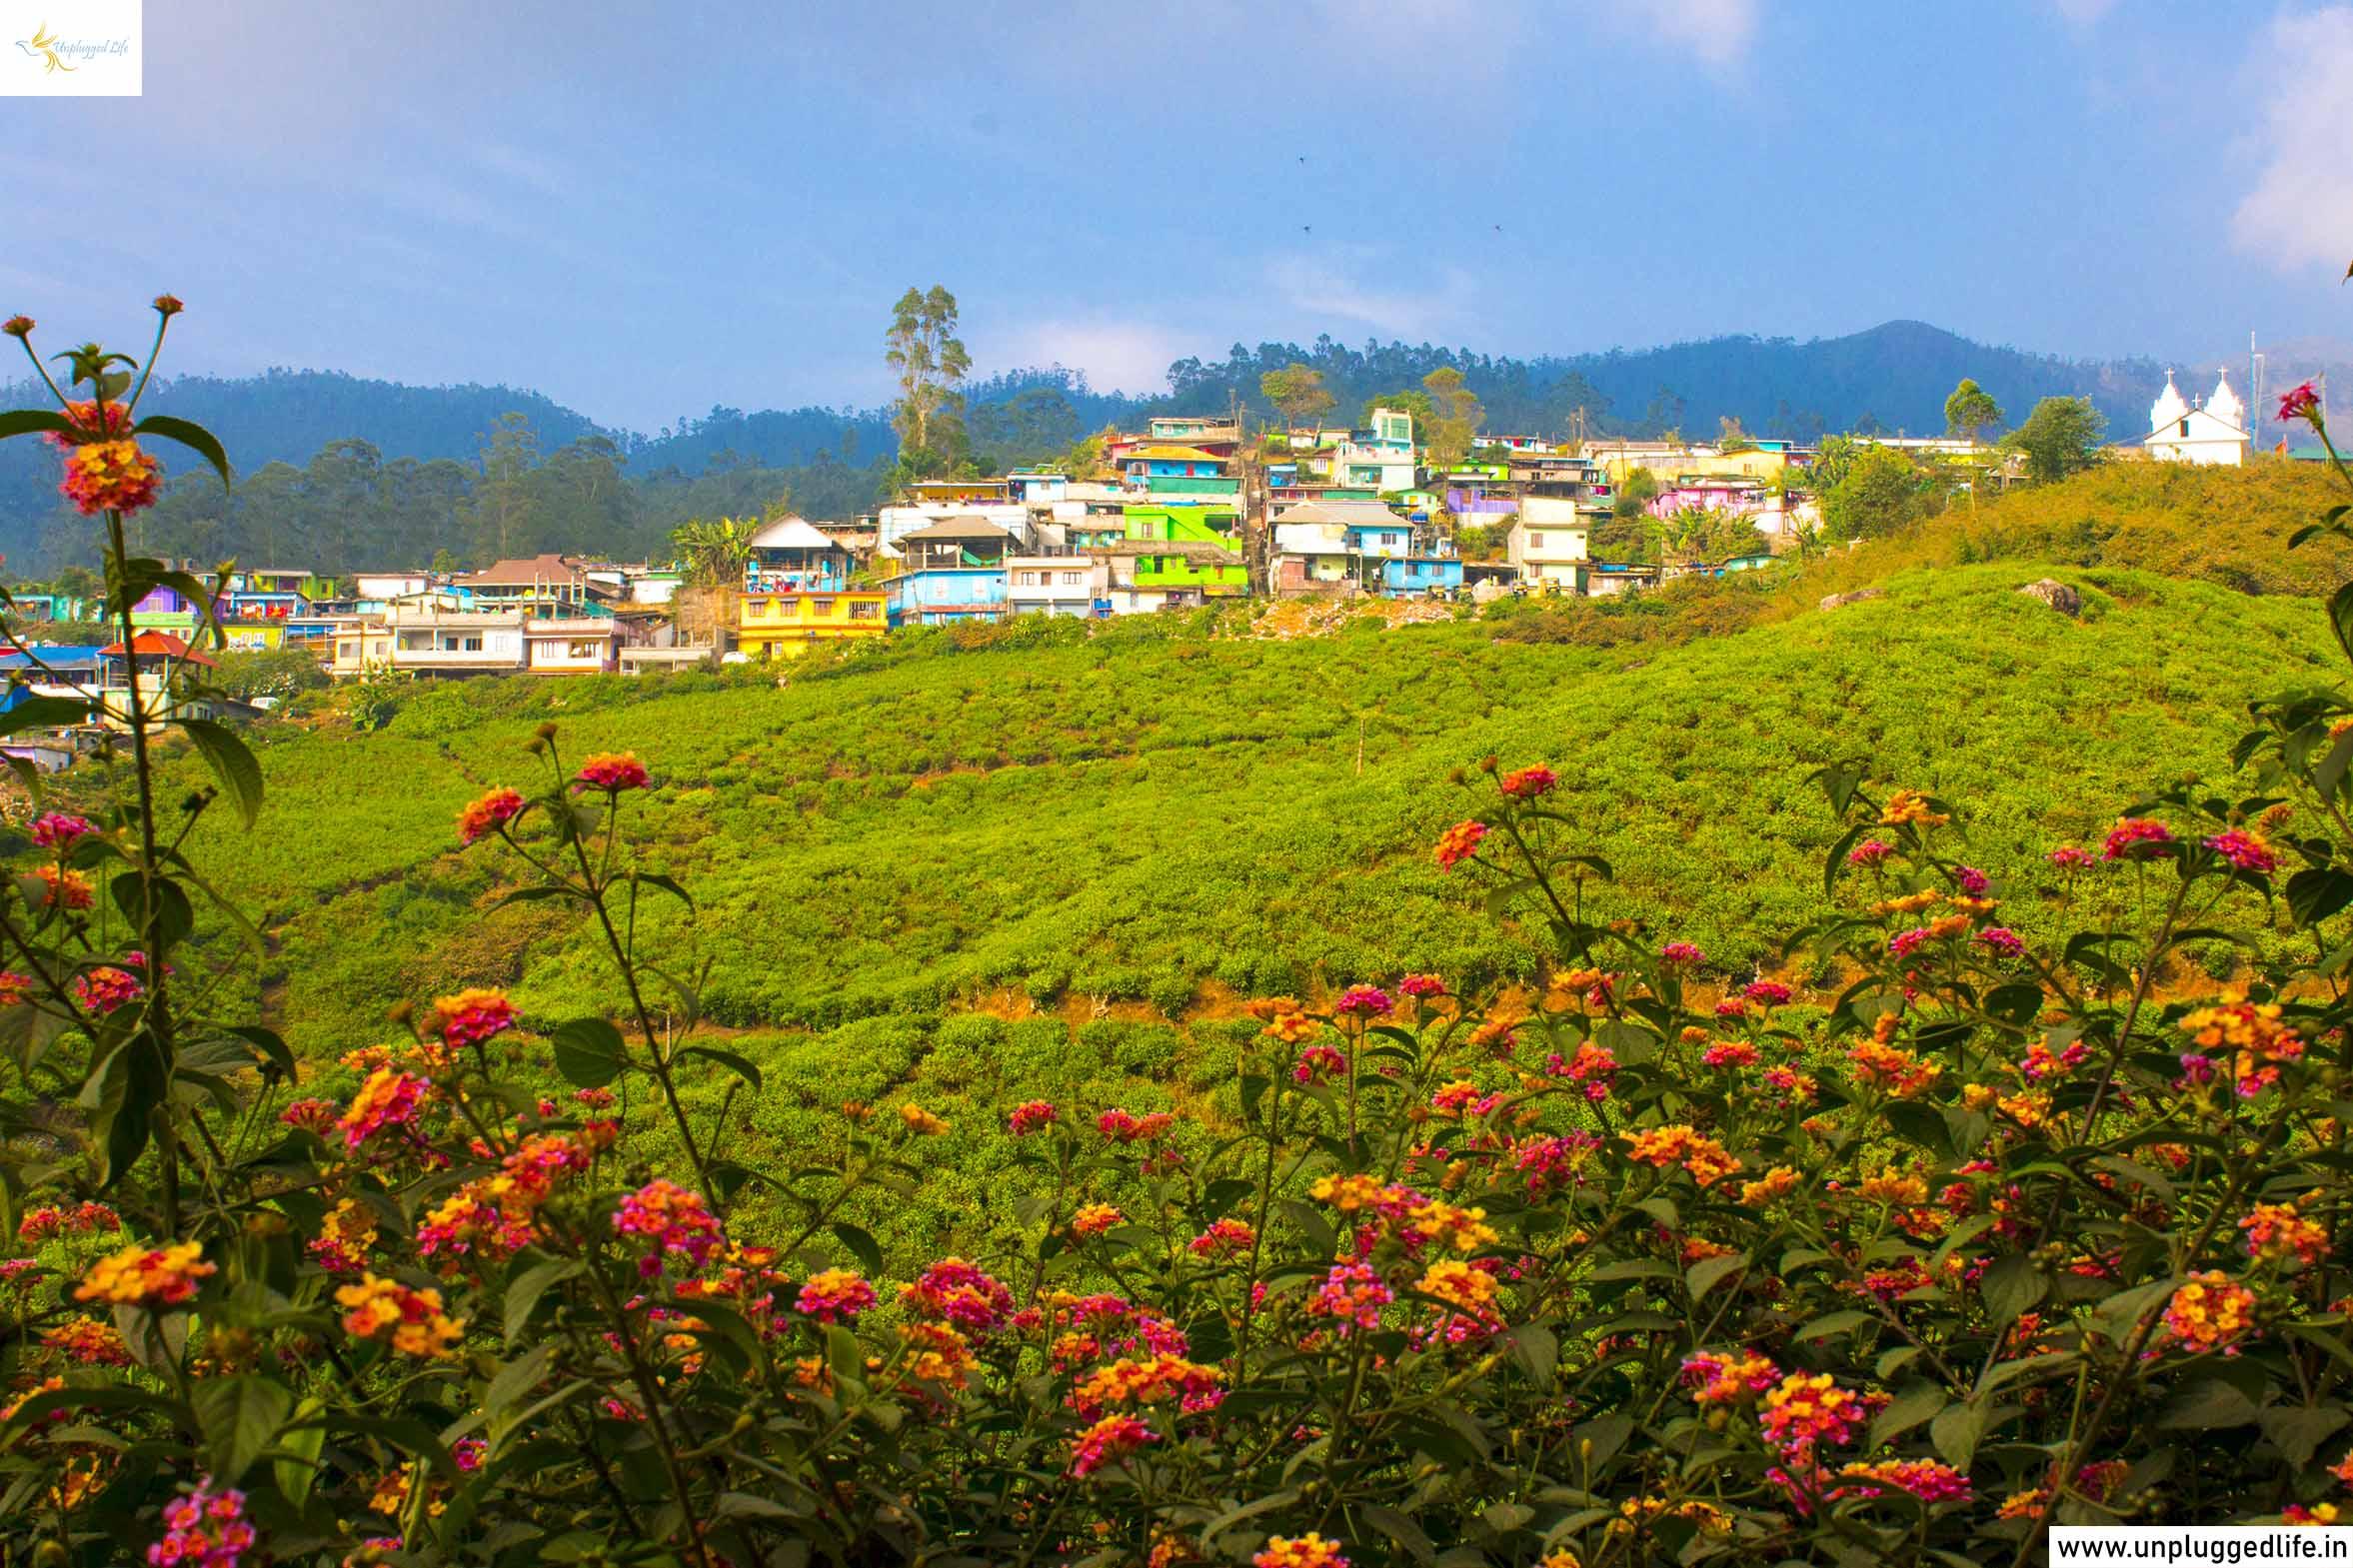 Unplugged Life, Munnar, Kerala, Travel to Kerala, Kochi to Kerala, Explore Munnar, Munnar Sightseeing, Canvas, Paining, Kerala Photography Tour, 7 days kerala itinerary, kerala package